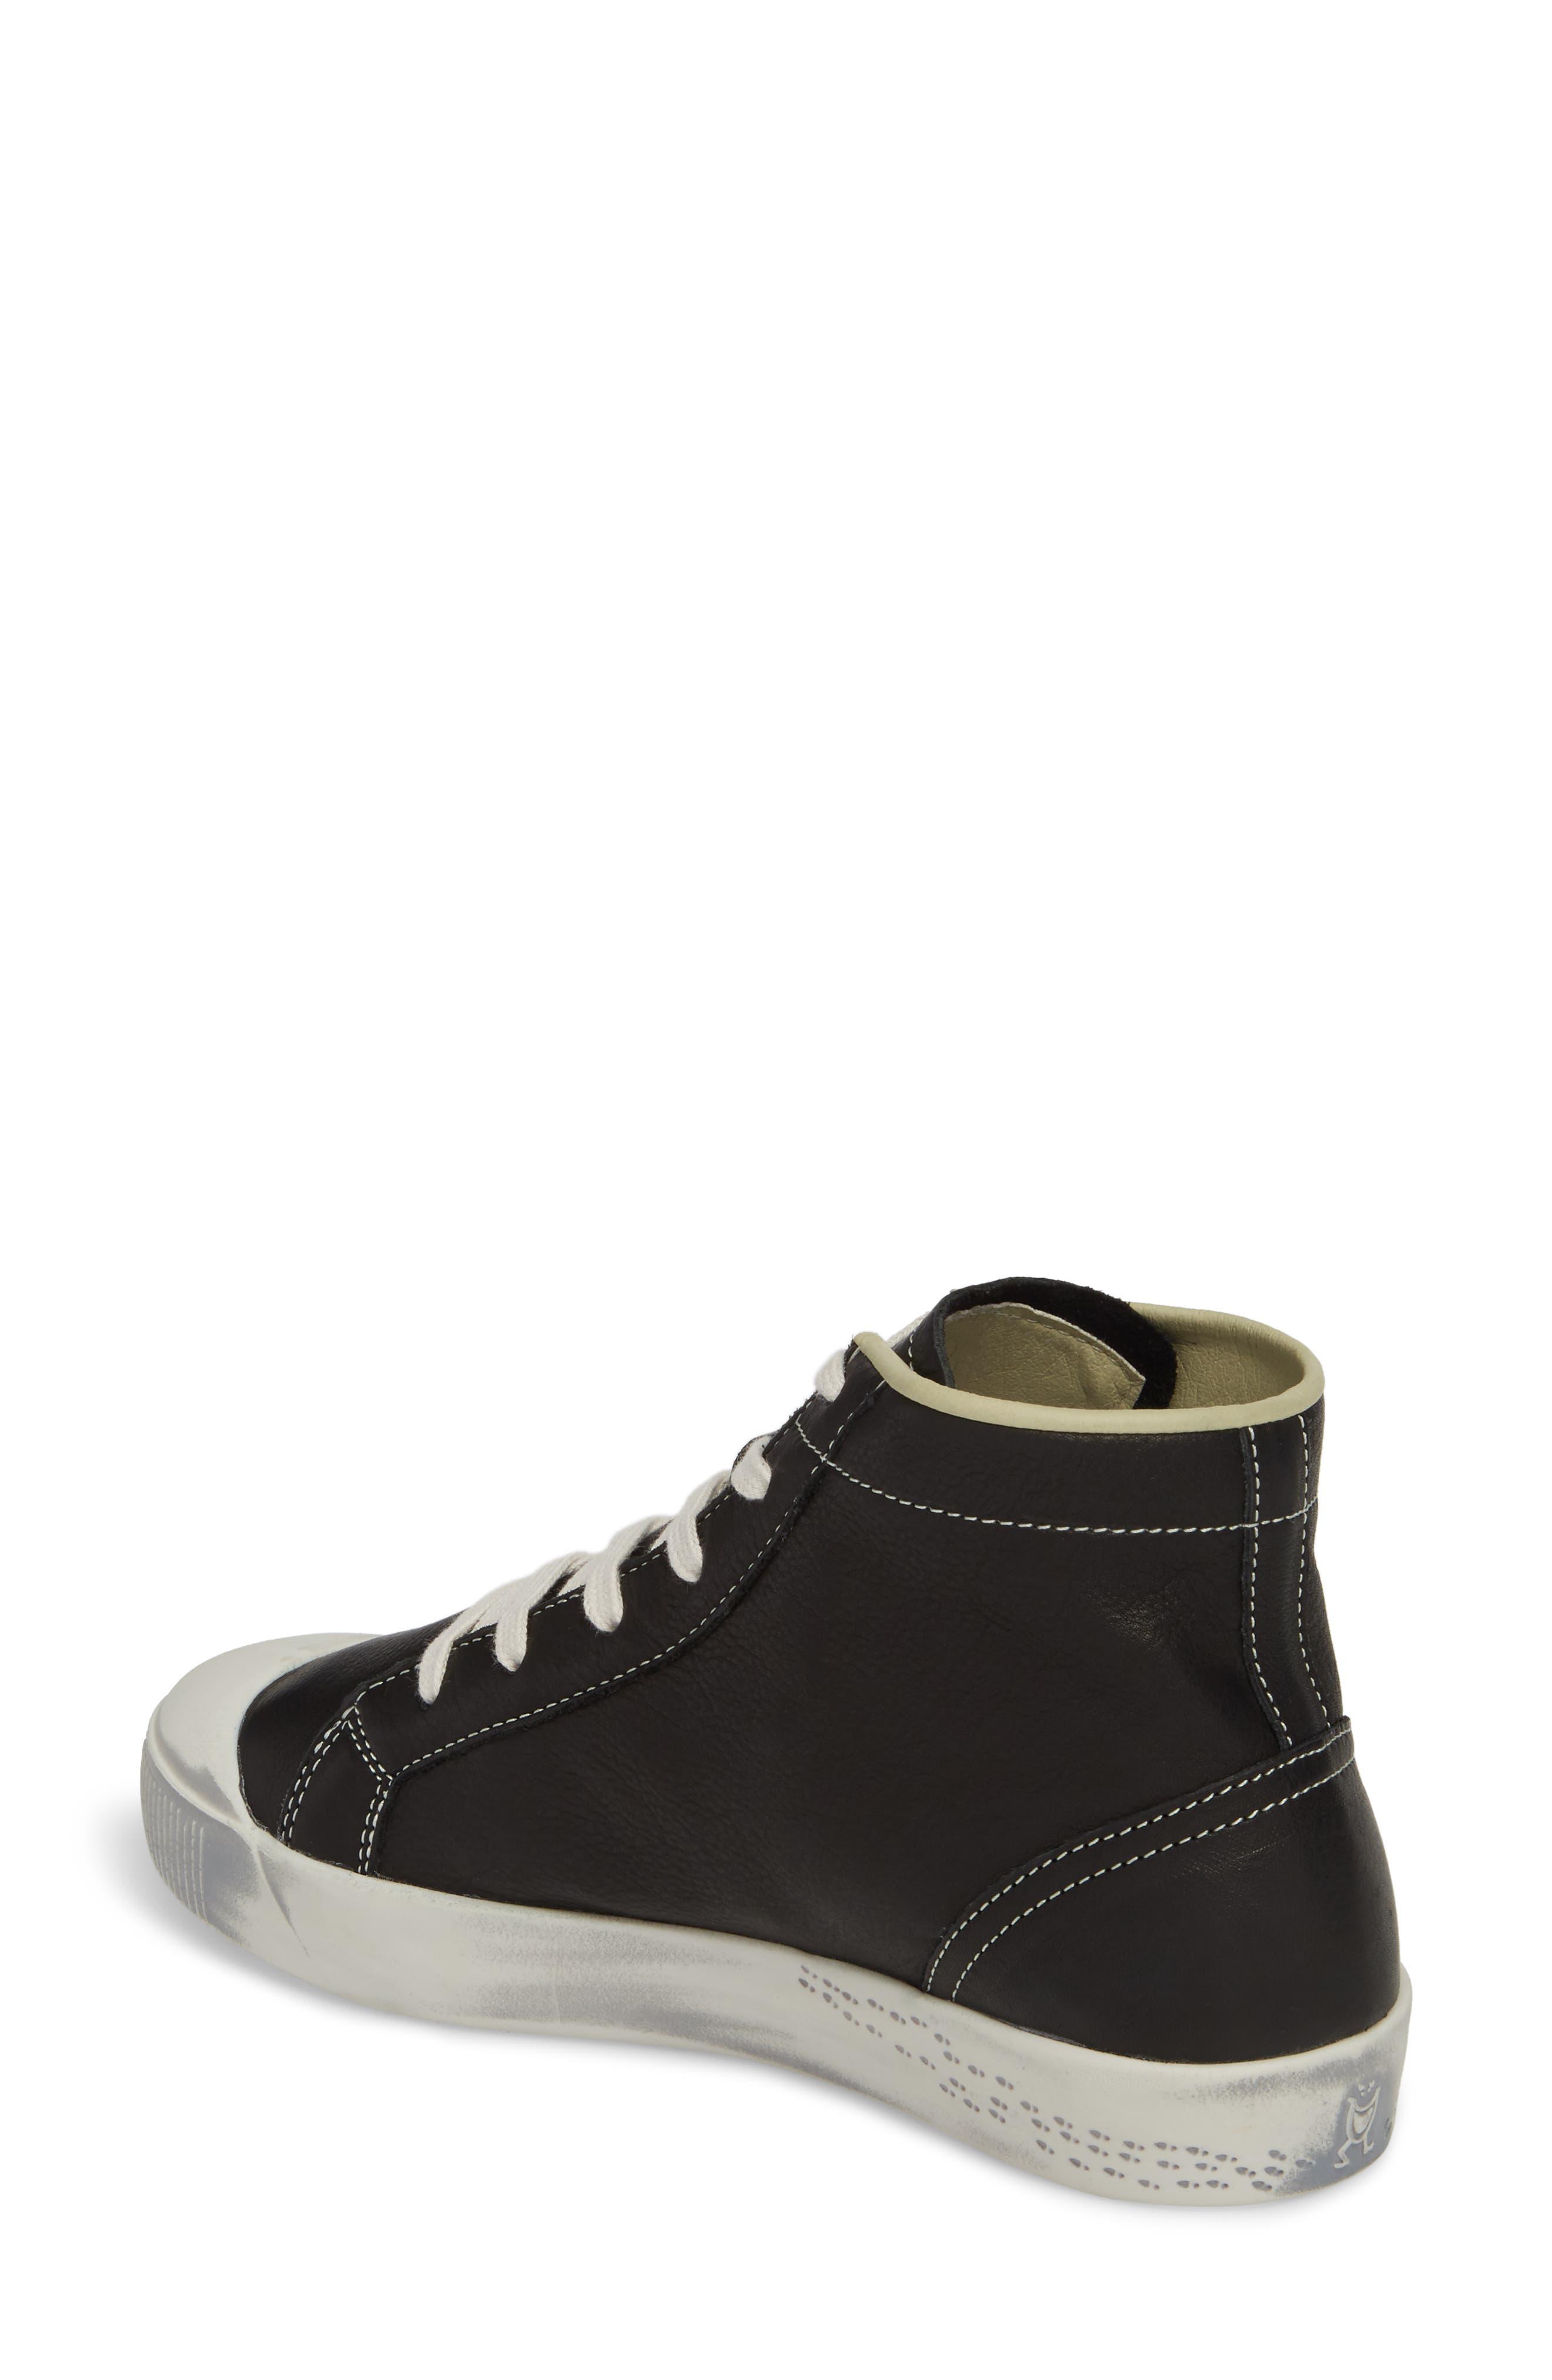 Kip High Top Sneaker,                             Alternate thumbnail 2, color,                             001